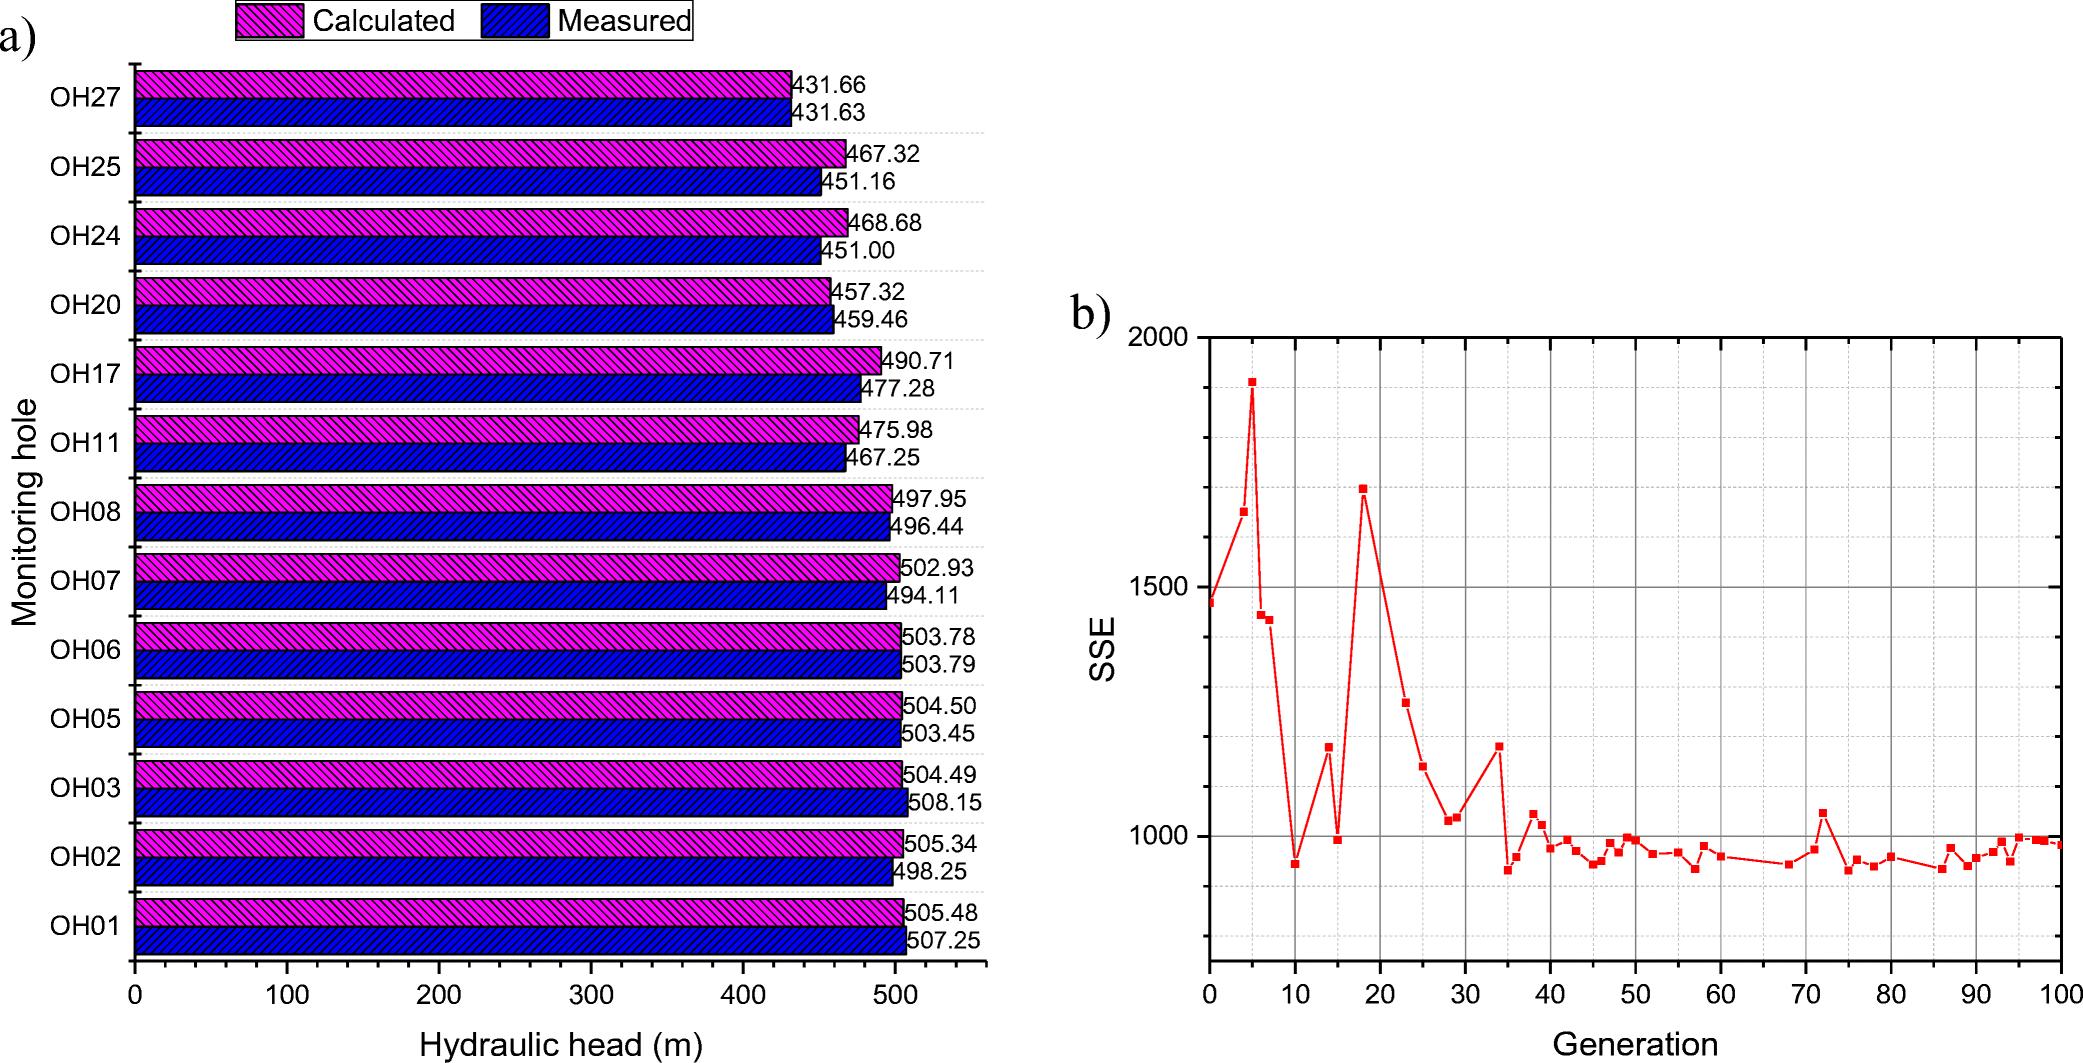 Simulation-optimization model for estimating hydraulic